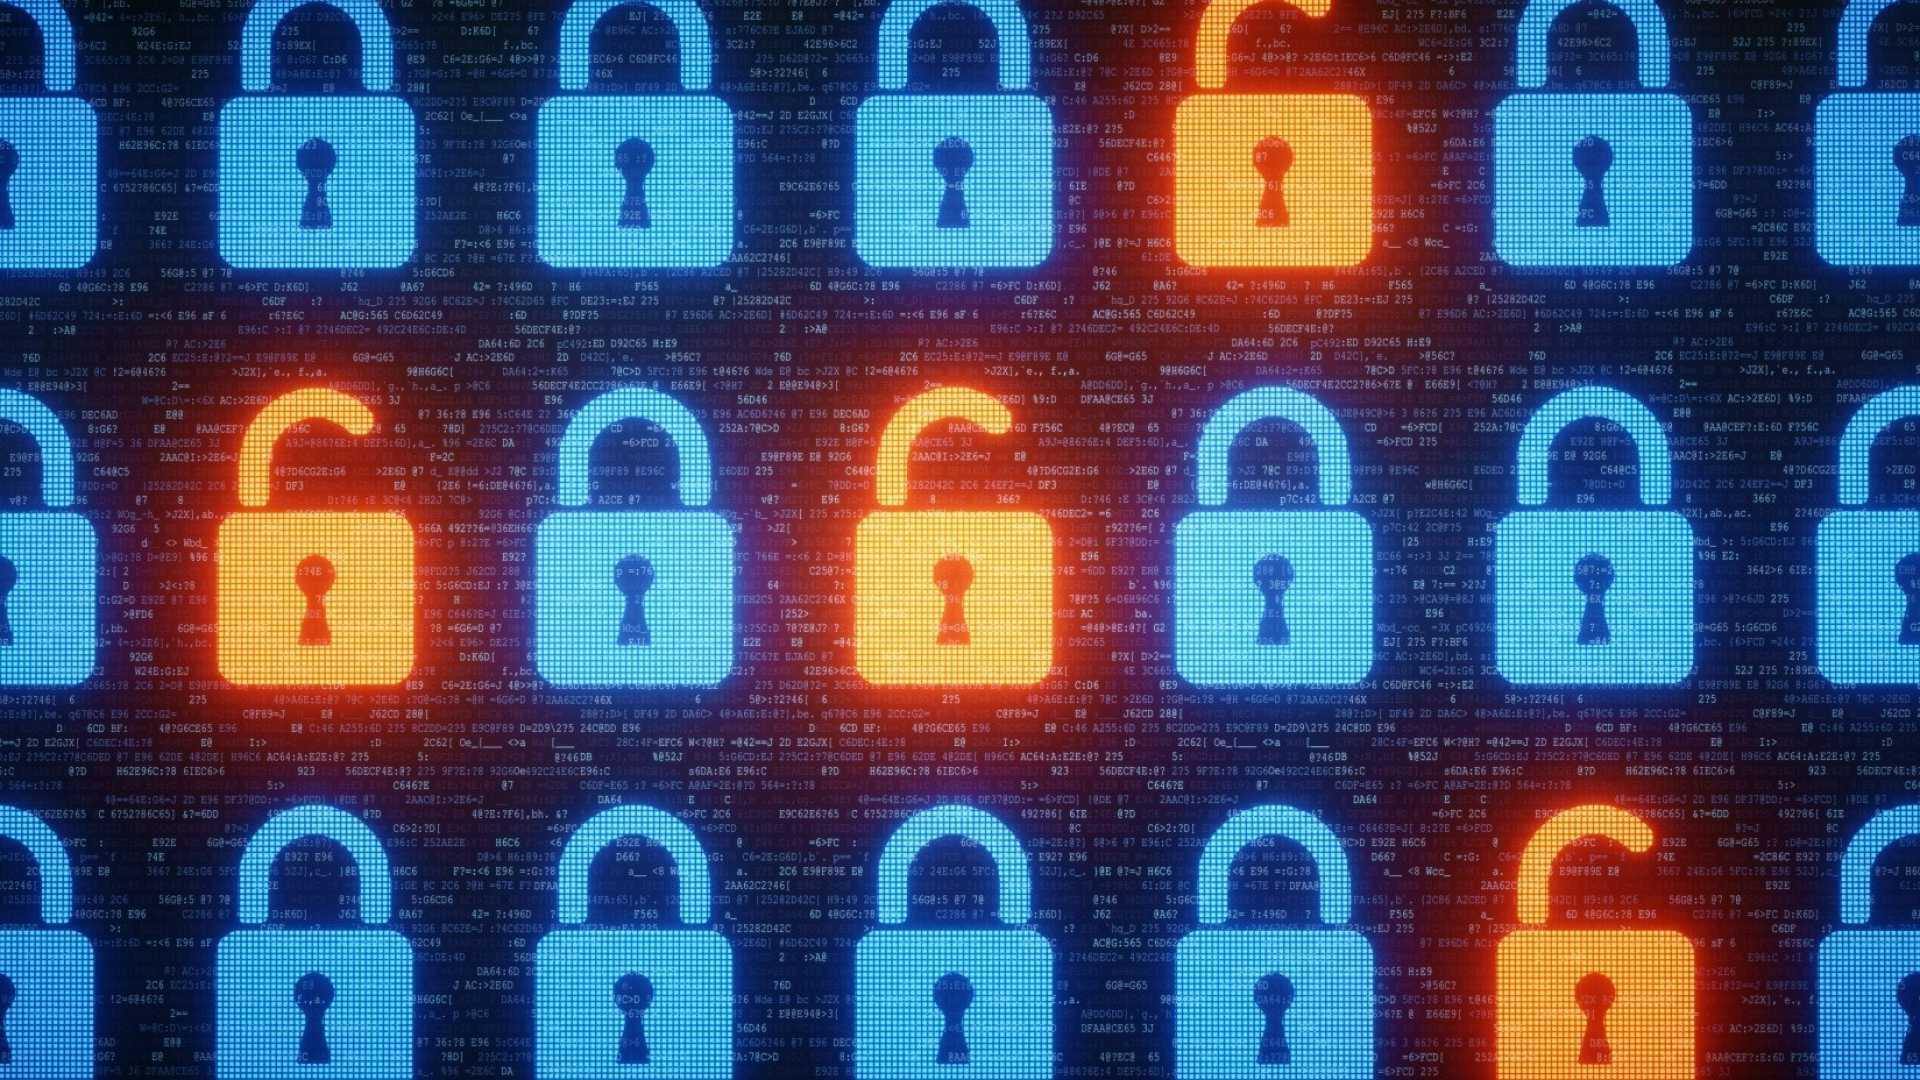 3 Ways to Practice Good Cybersecurity Hygiene